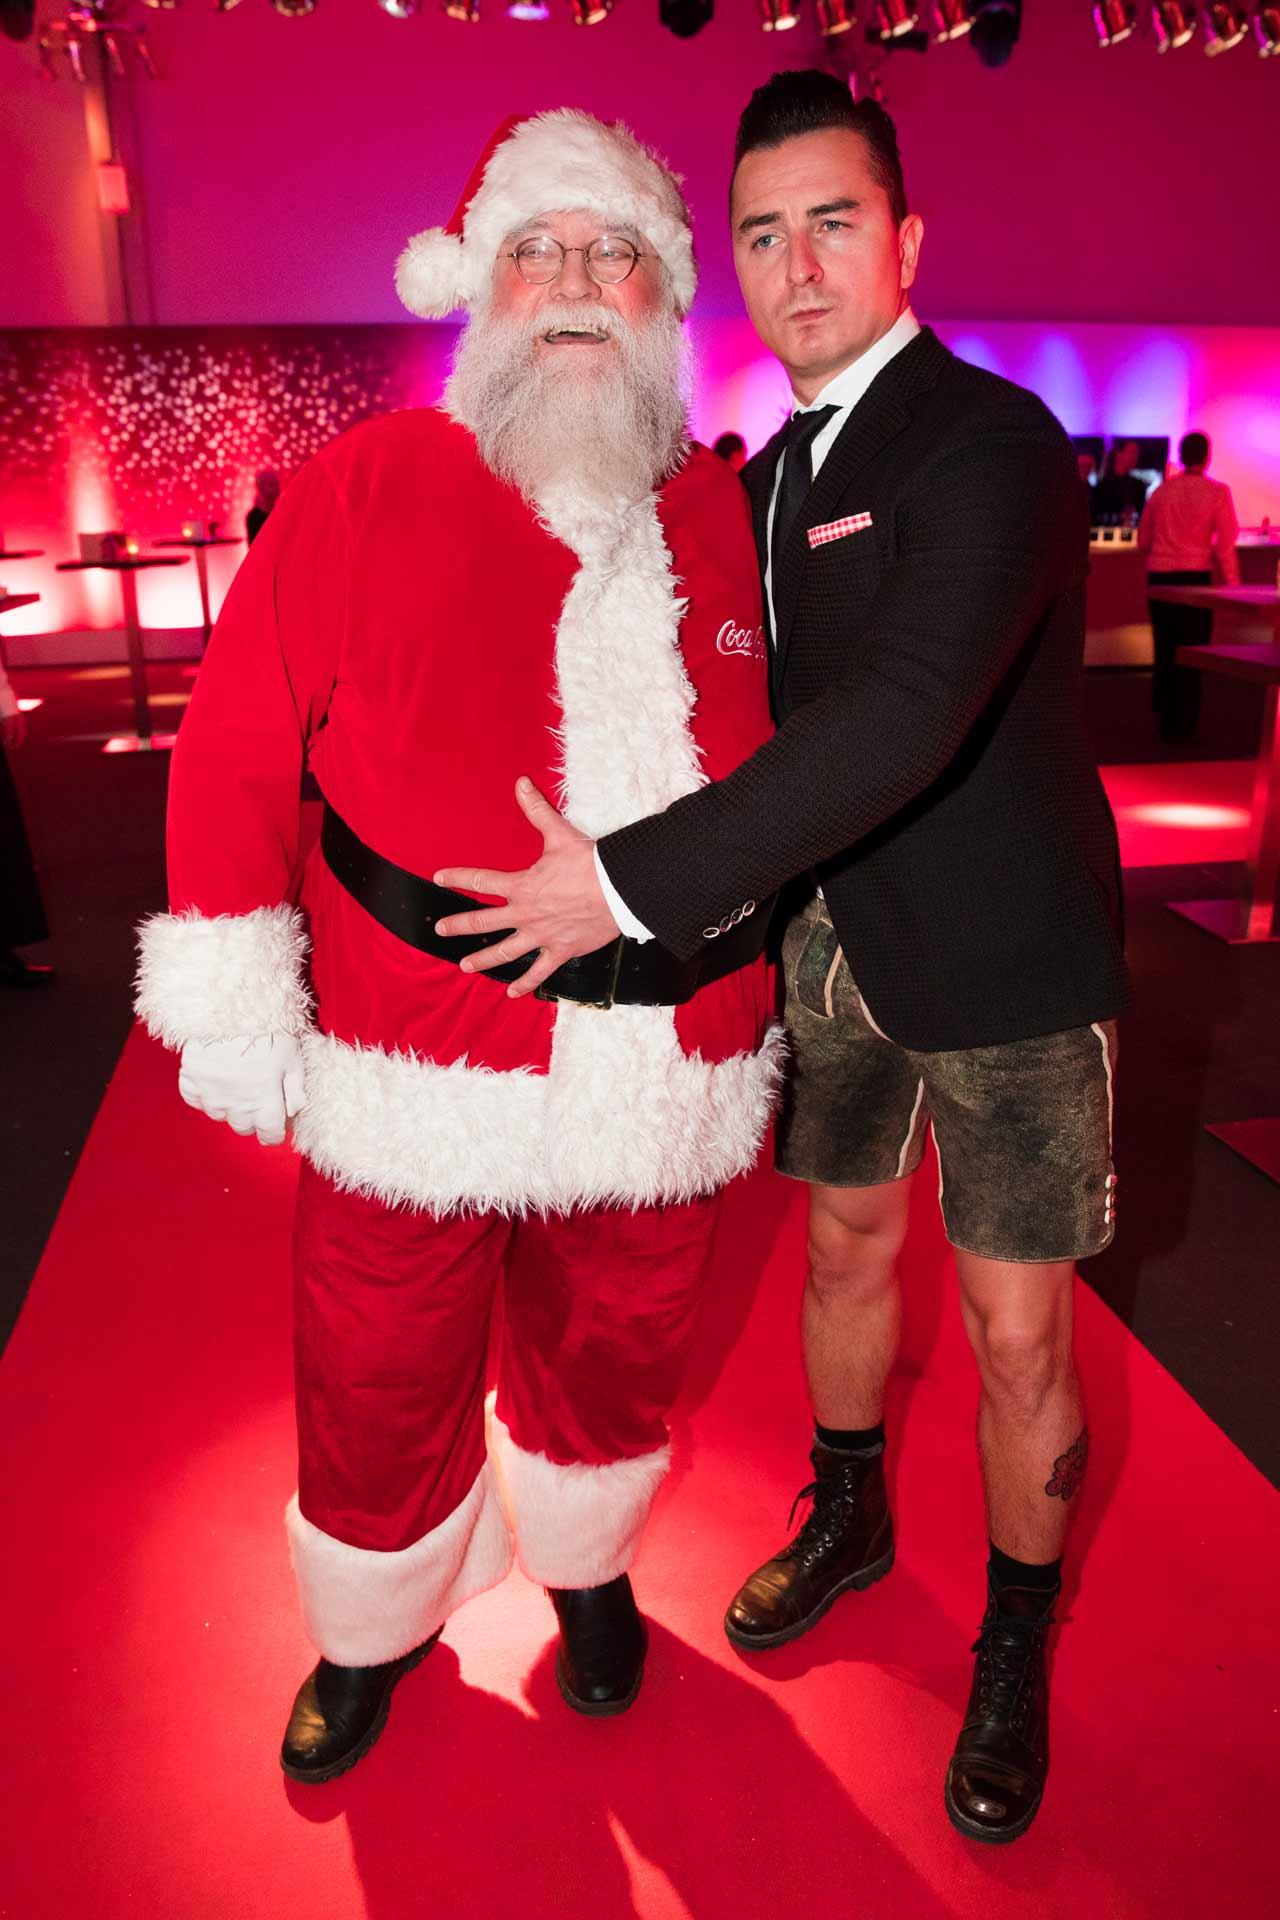 Andreas-Gabalier-Coke-Santa-Claus